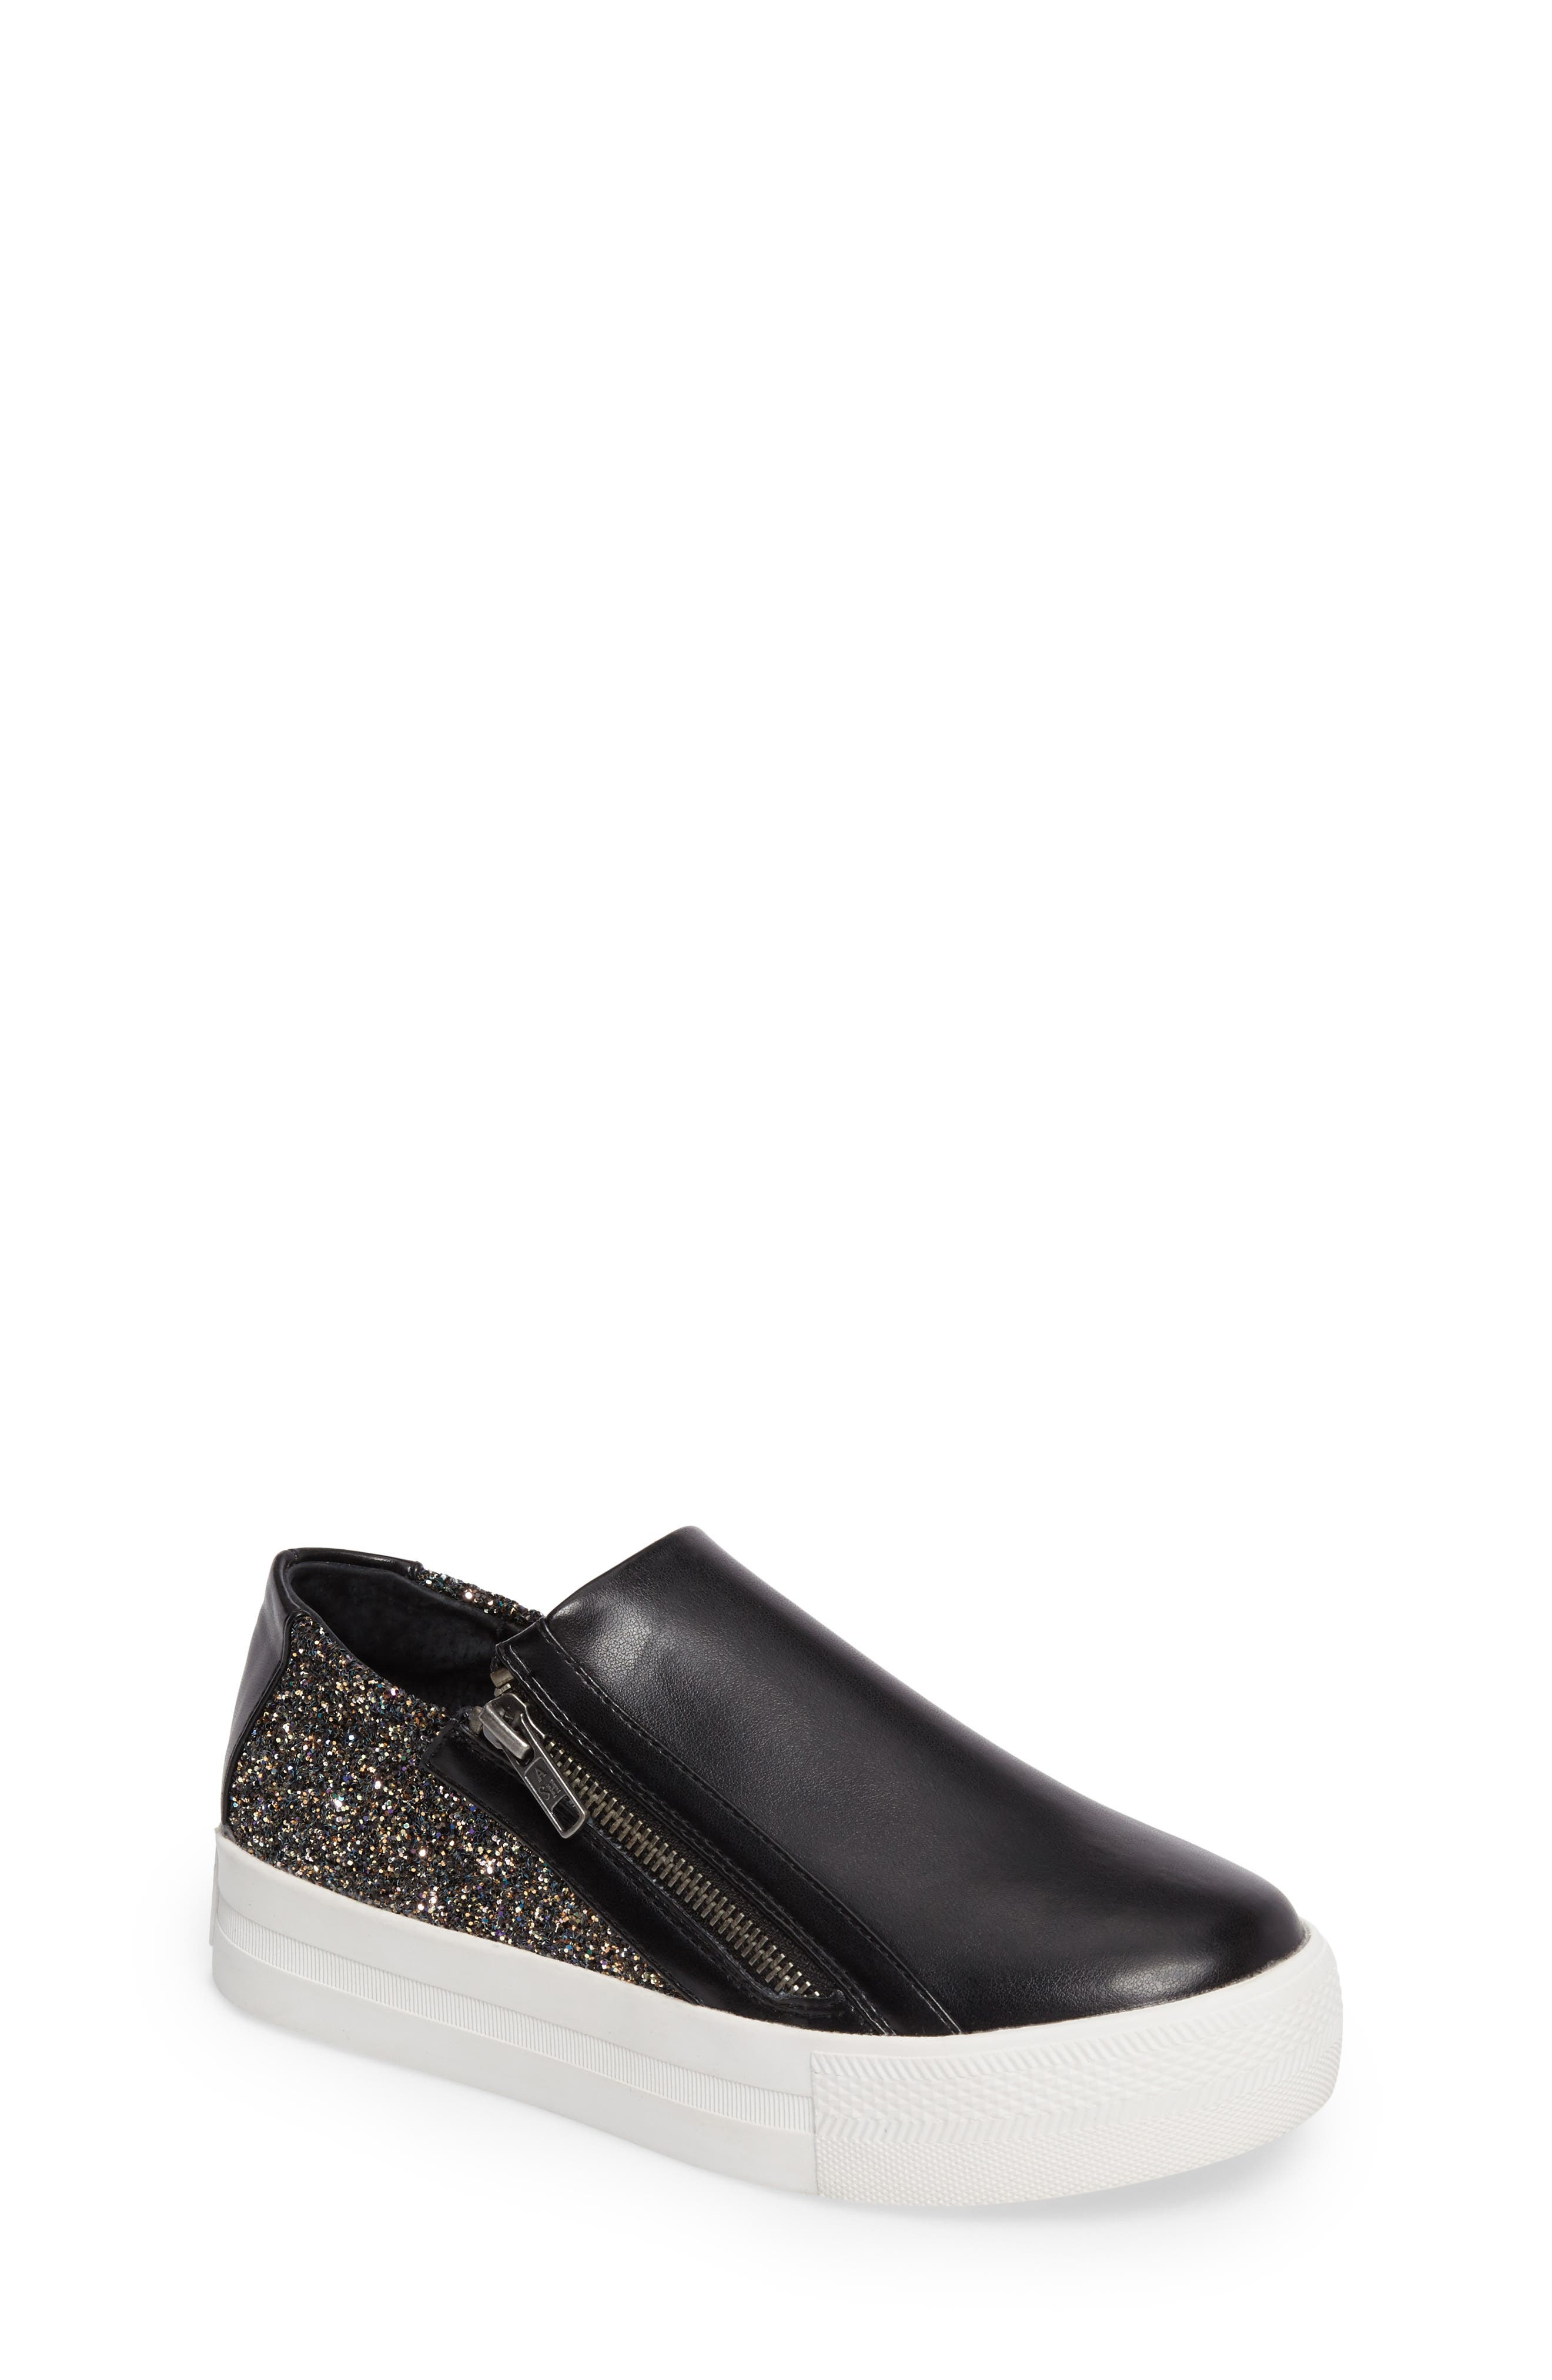 Lynn Monica Glittery Zip Sneaker,                             Main thumbnail 1, color,                             Black Faux Leather